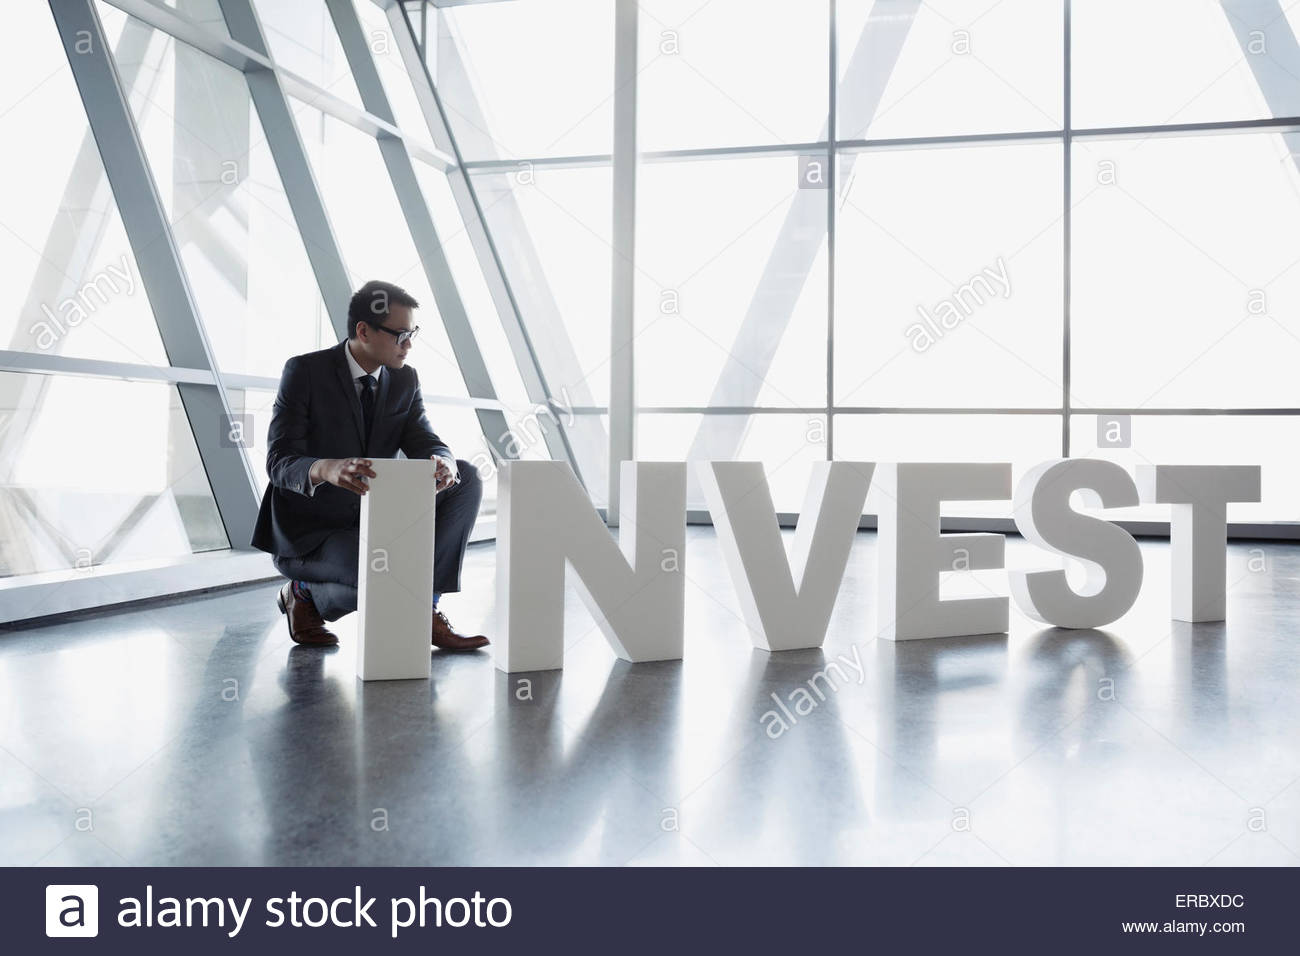 Man in suit l'organisation 'Investir' lettres Photo Stock